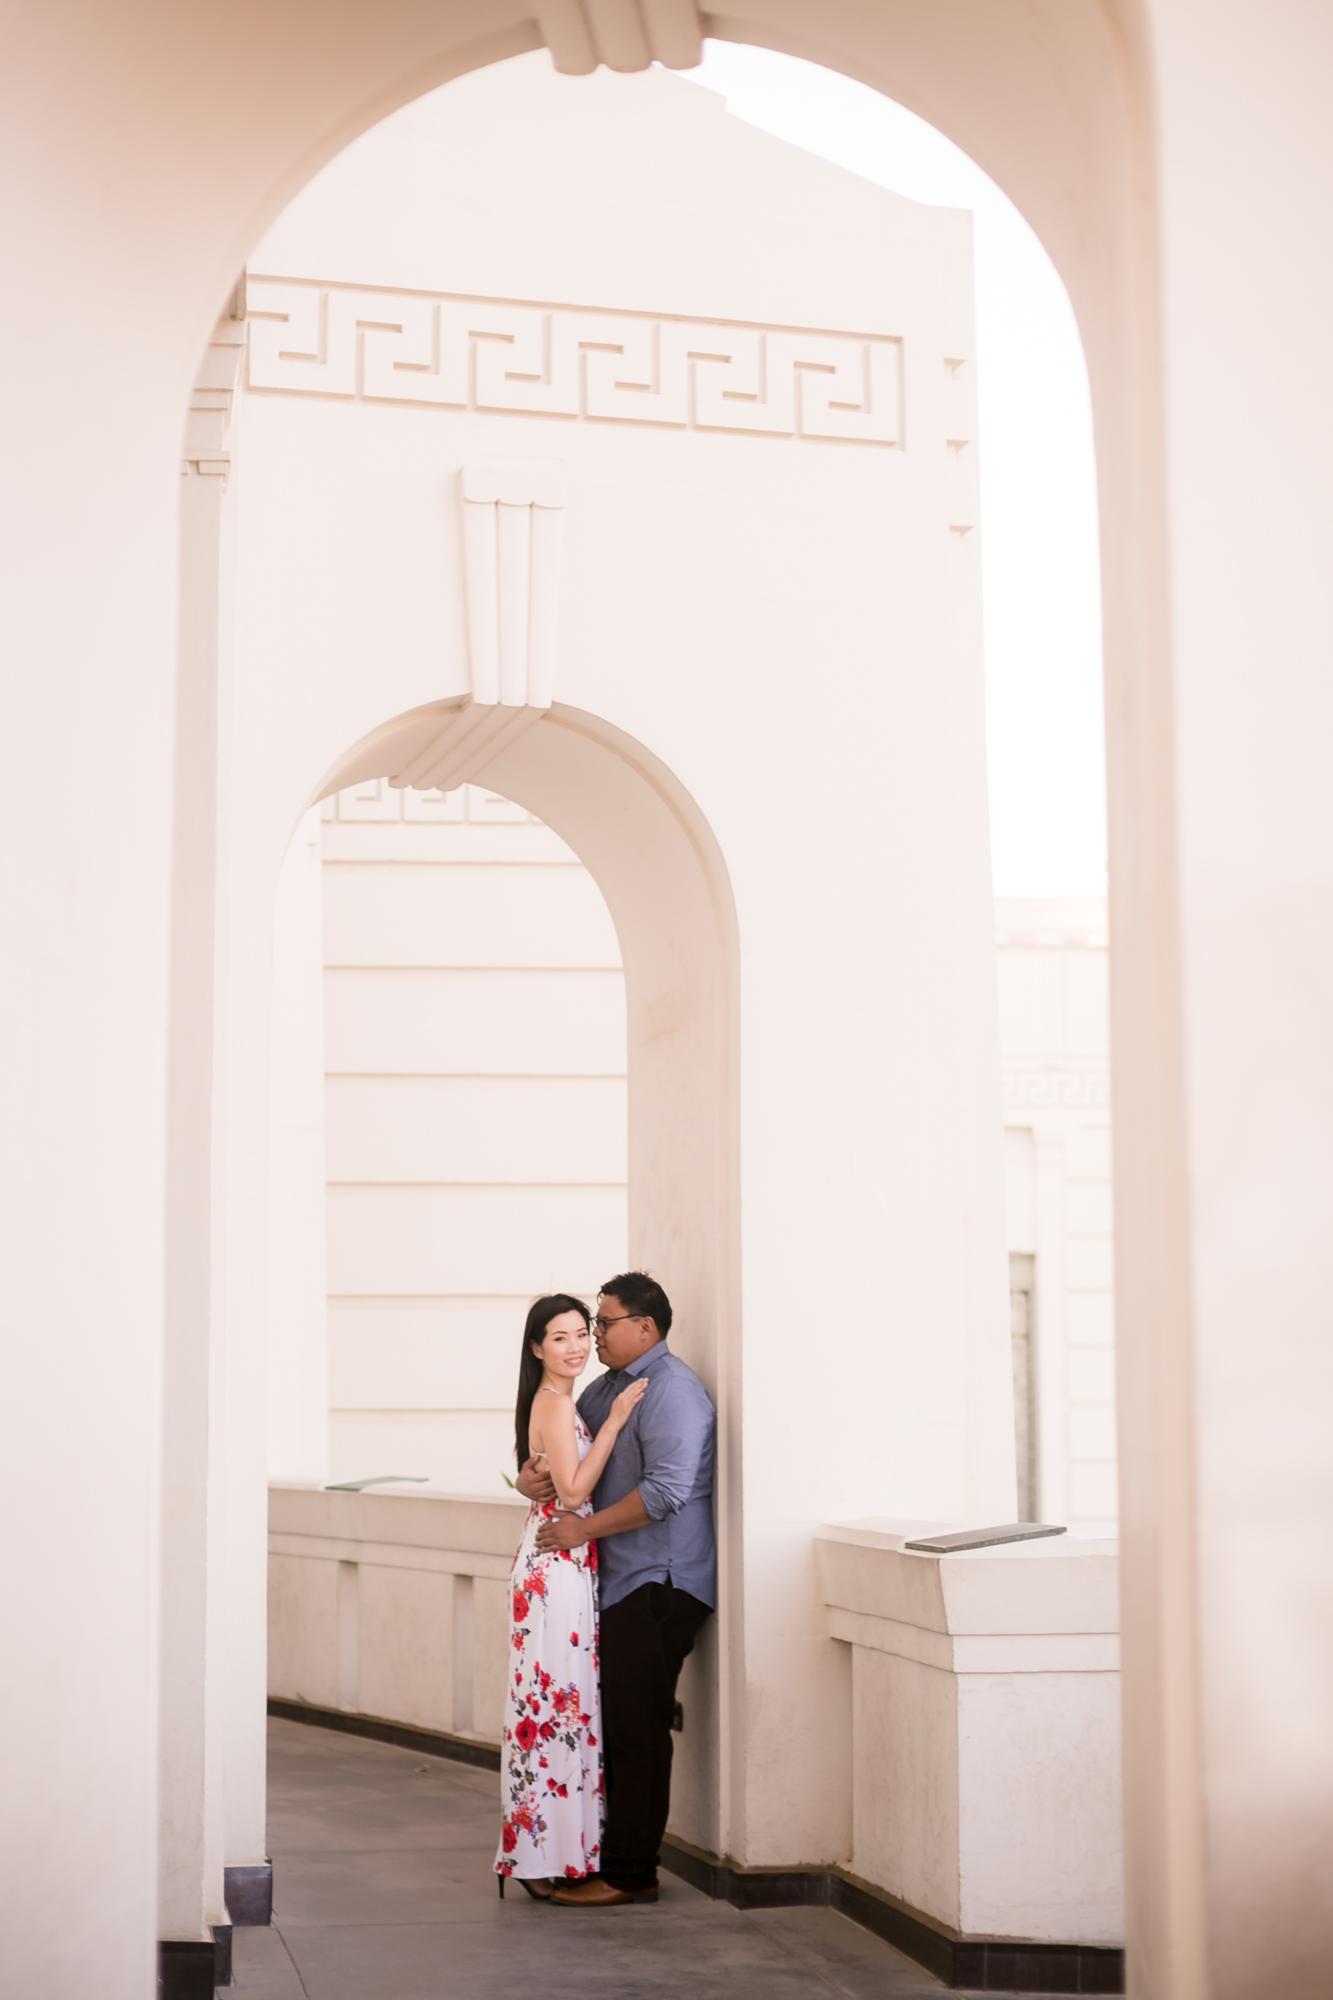 CM-Pasadena_City-Hall-Engagement-Photography-0006.jpg